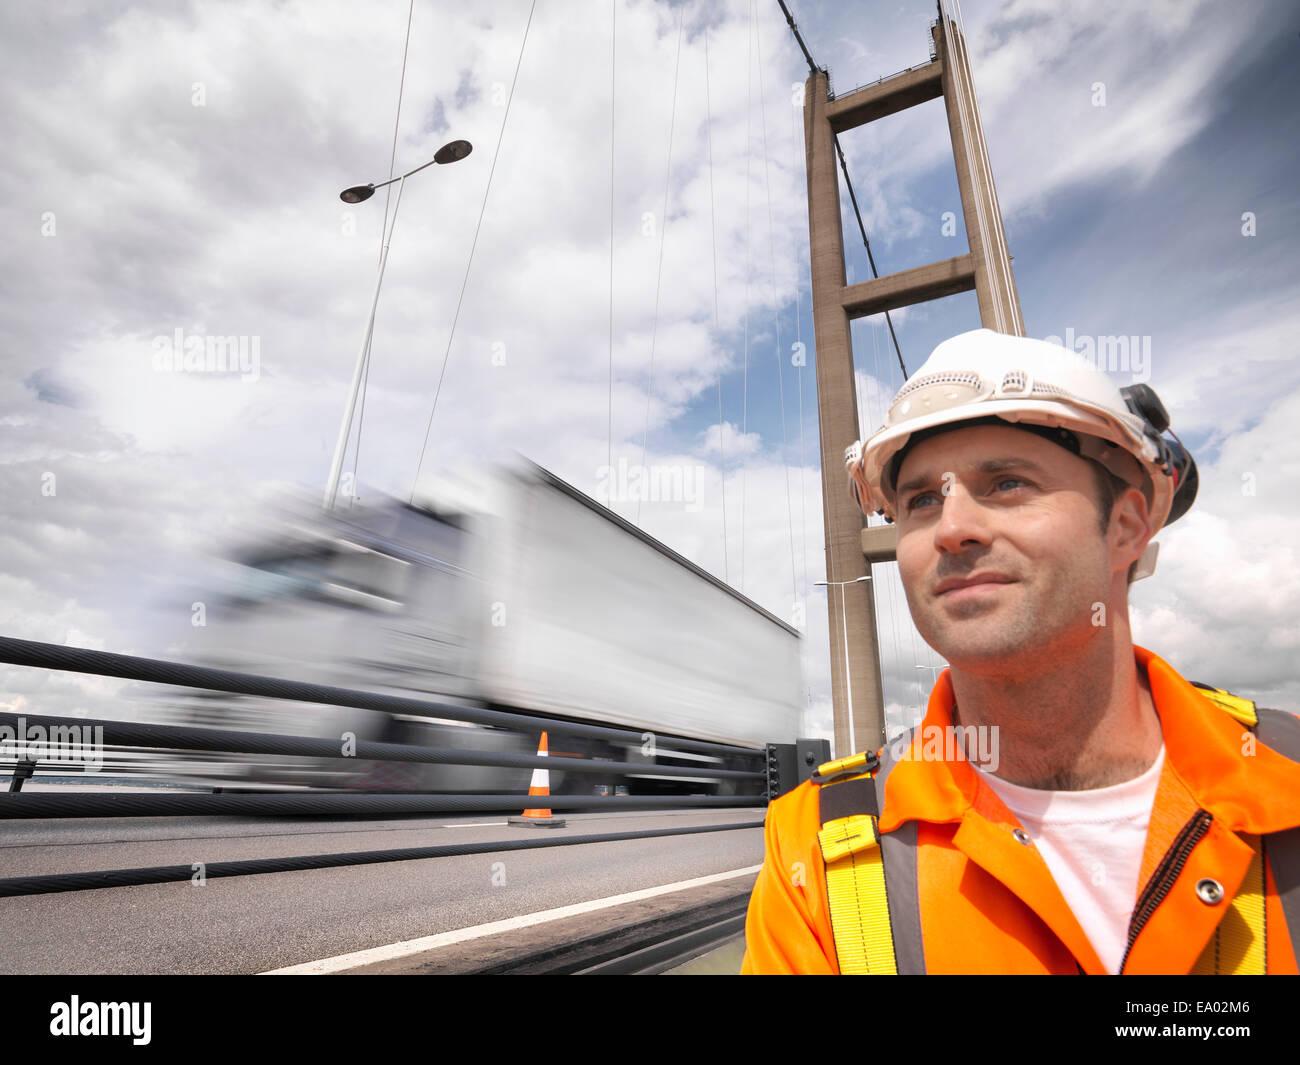 Bridge worker close to traffic on suspension bridge Humber Bridge UK was built in 1981 Stock Photo